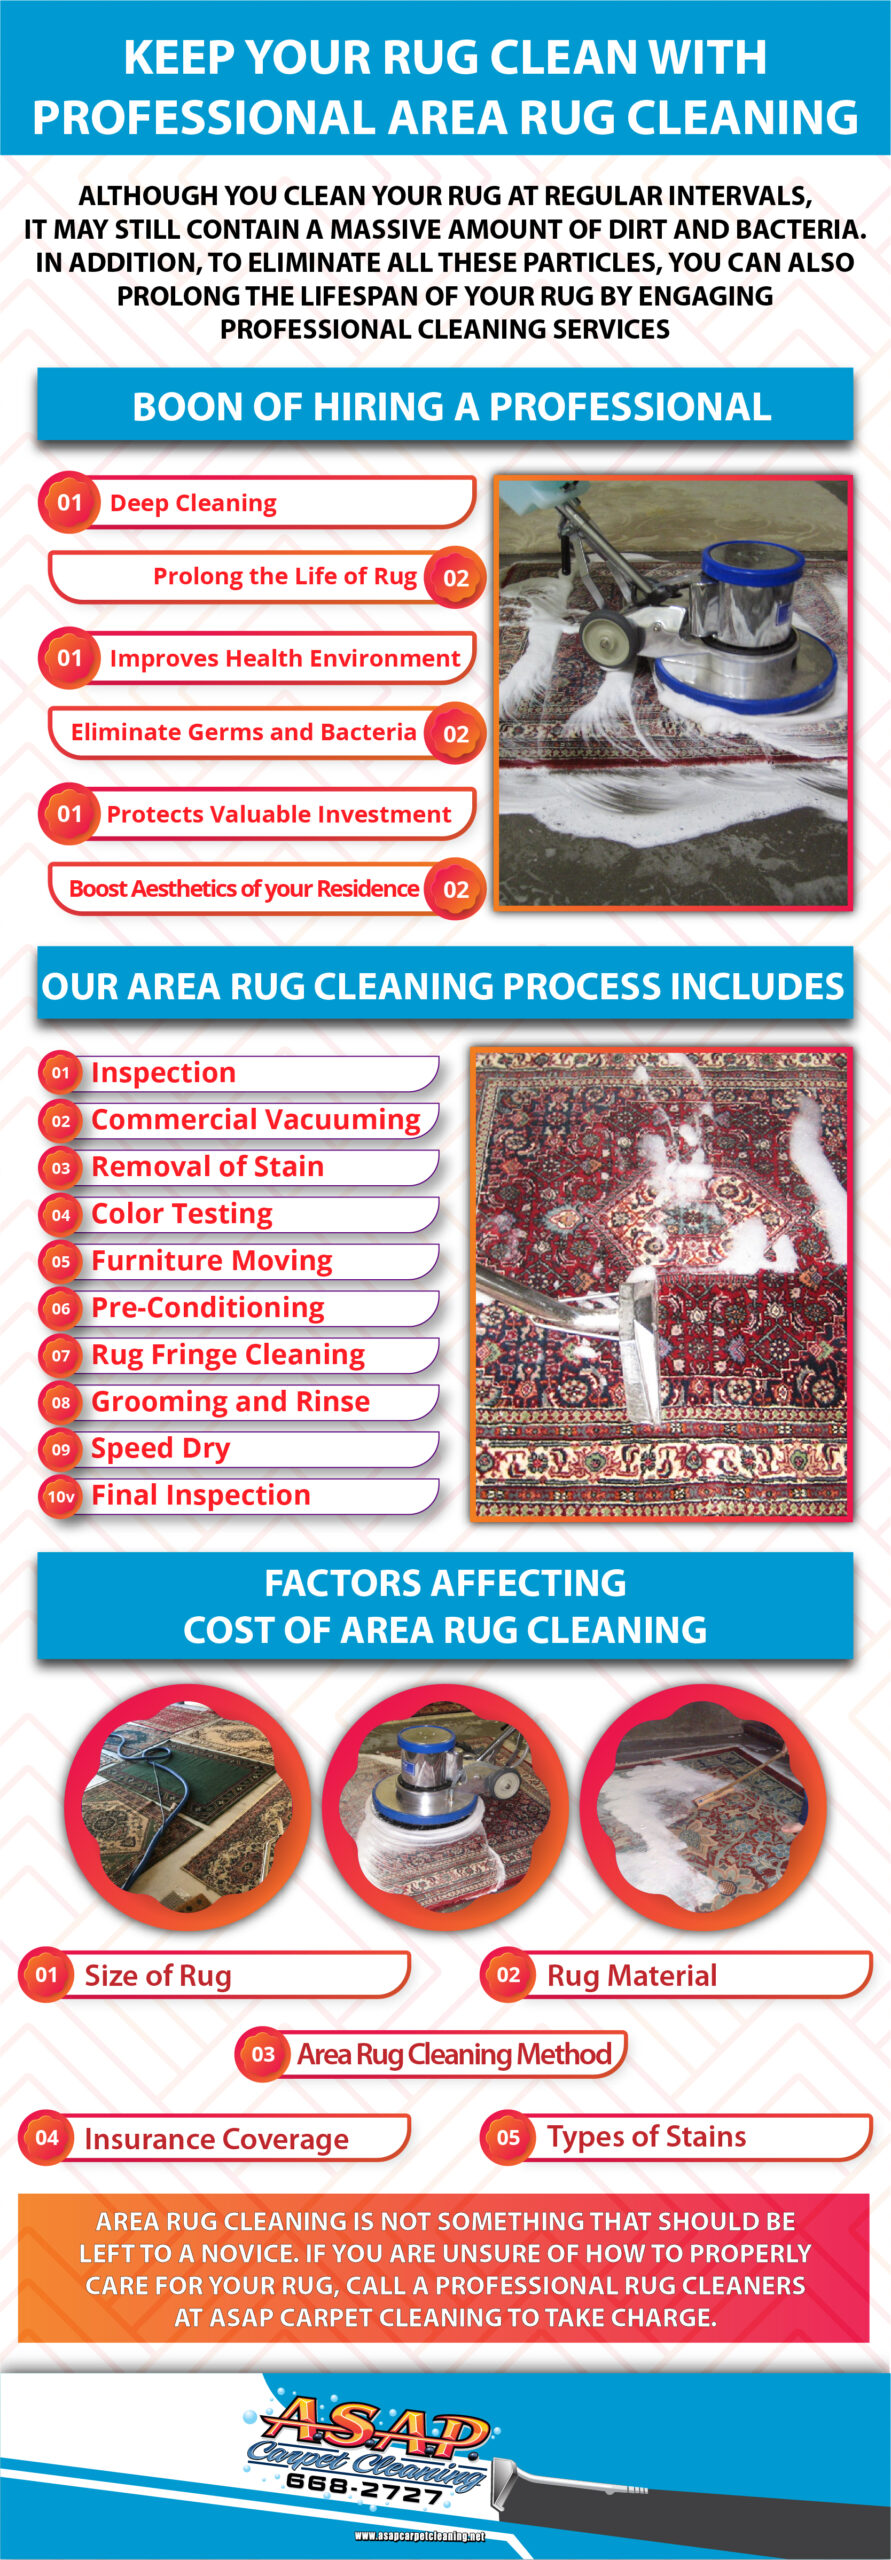 Professional Area Rug Cleaning Turlock CA